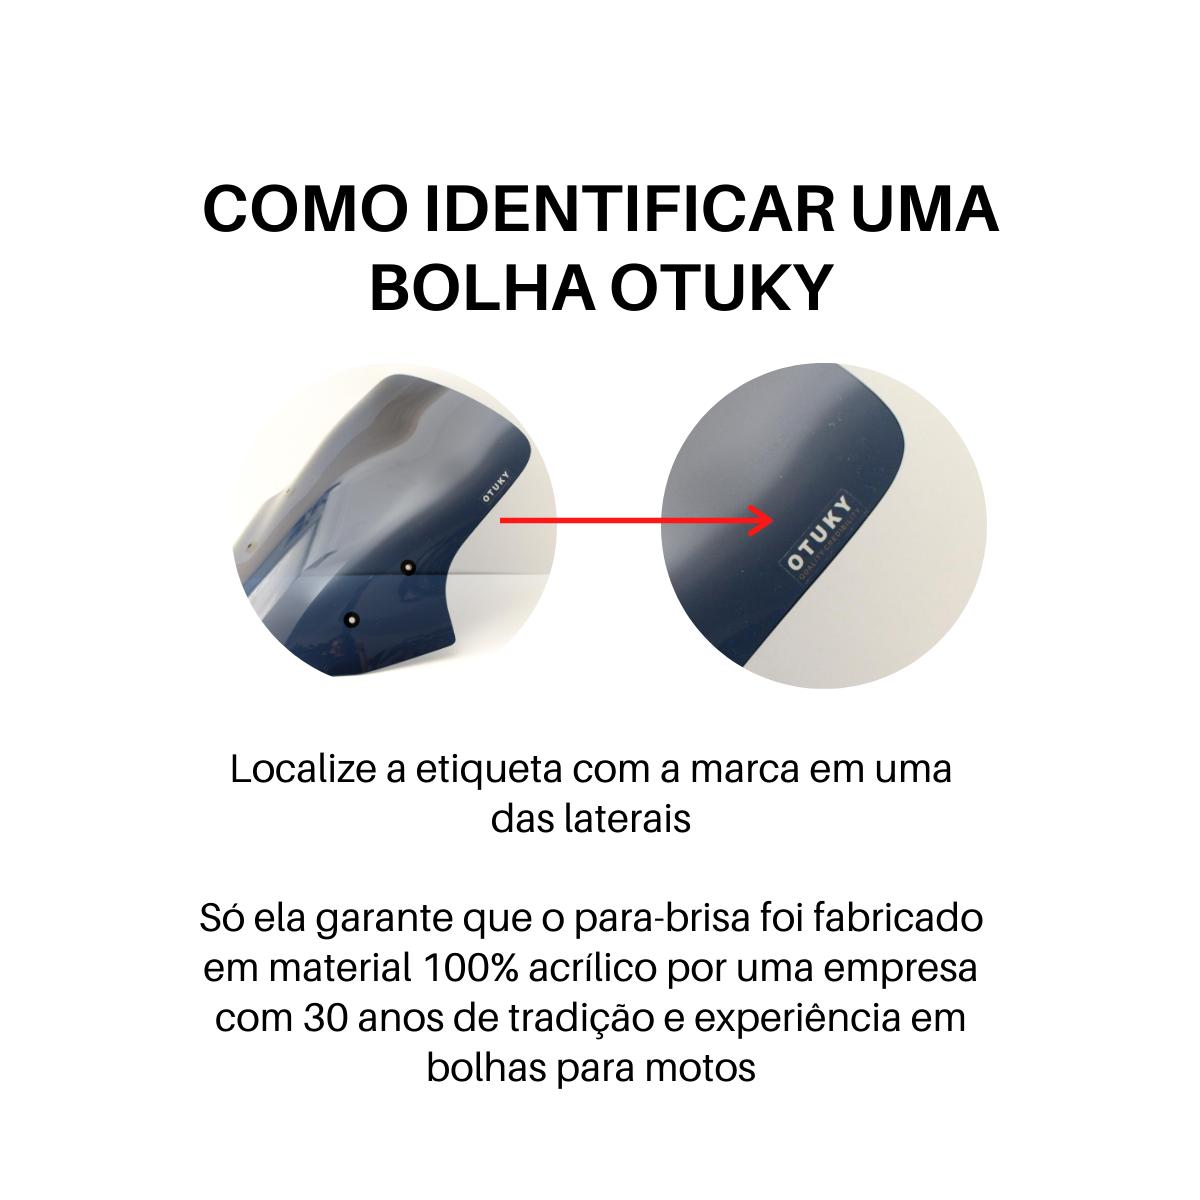 Bolha para Moto GSX 1300 R Hayabusa 2008 2009 2010 2011 2012 2013 2014 2015 2016 2017 2018 Otuky Fumê Escuro Azulado